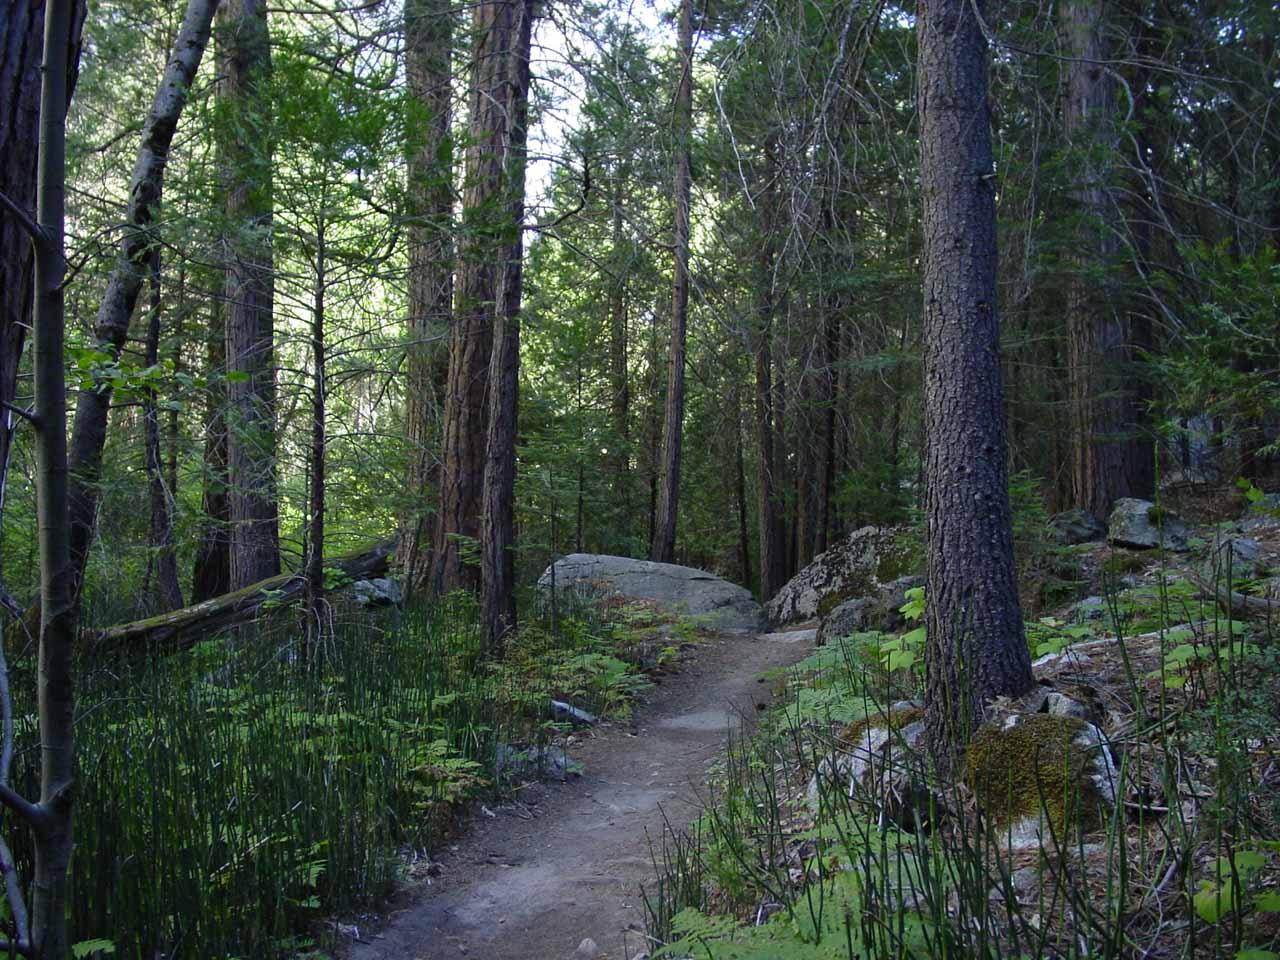 The forest got denser the further I went